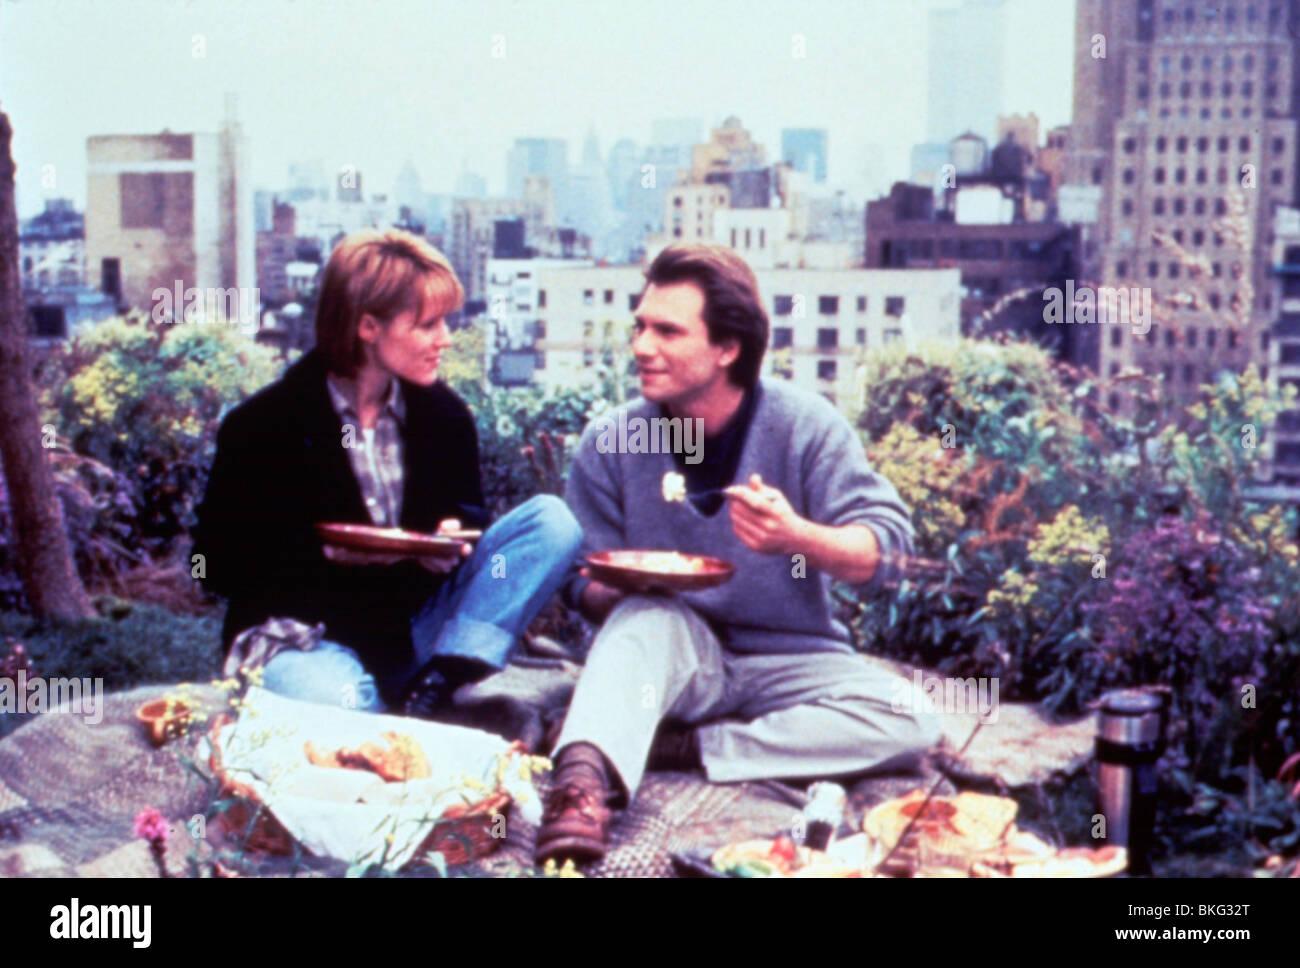 BED OF ROSES (1996) MARY STUART MASTERSON, CHRISTIAN SLATER BDRO 007 Stock Photo